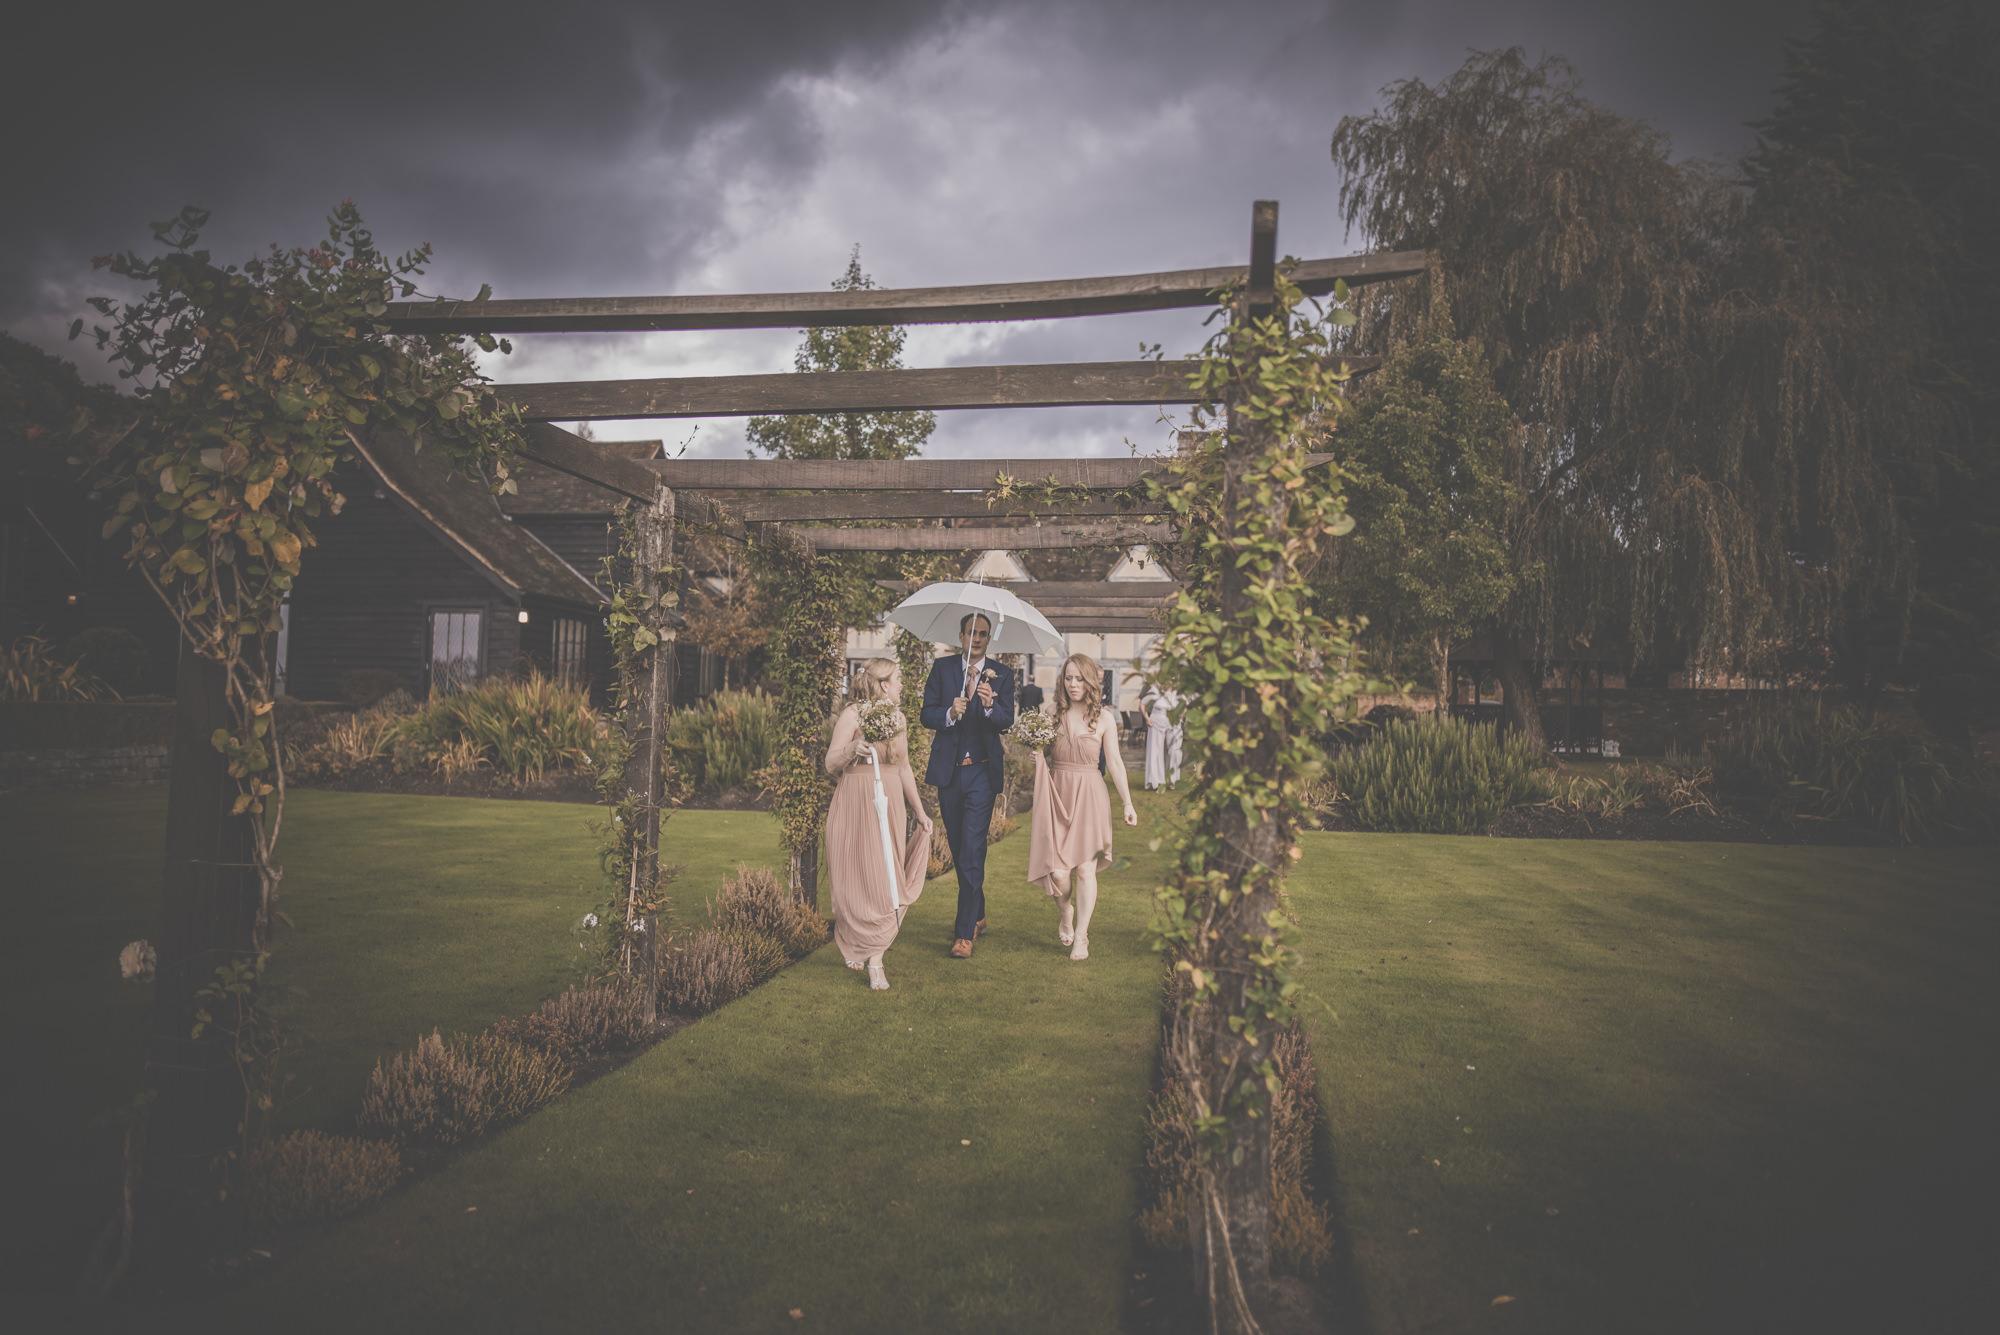 Charisse-and-James-wedding-in-Cain-Manor-Venue-Hampshire-Manu-Mendoza-Wedding-Photography-373.jpg